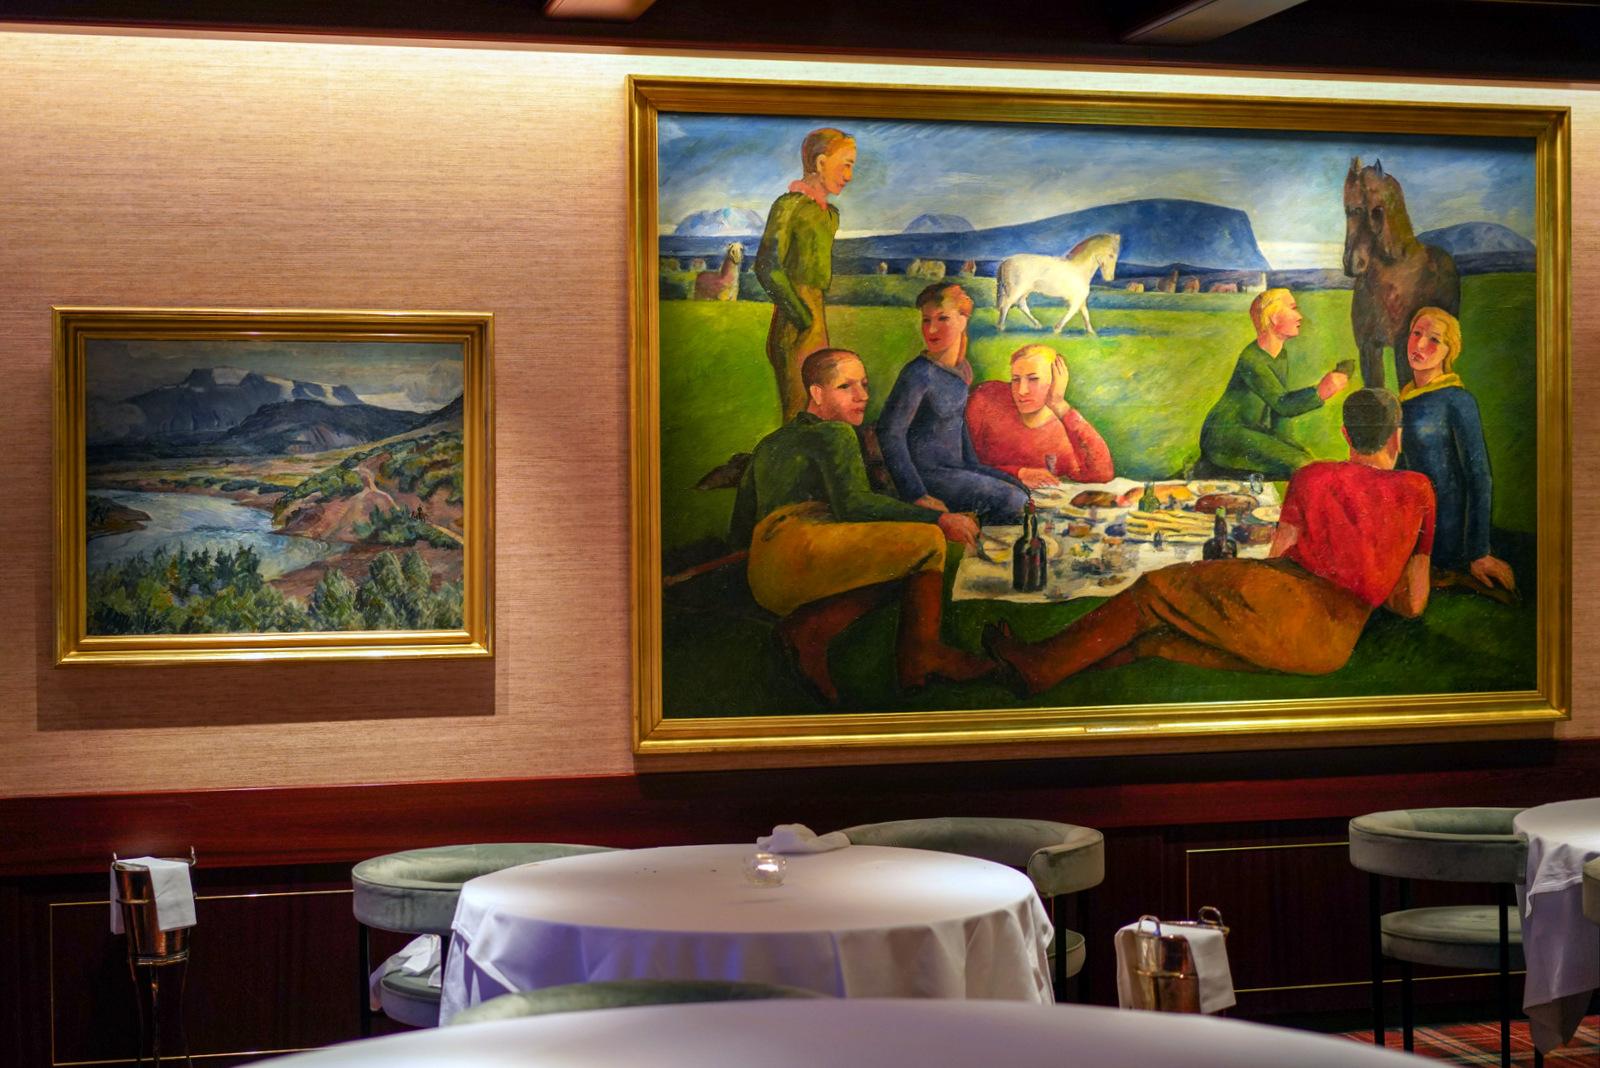 holt restaurant, reykjavik, iceland